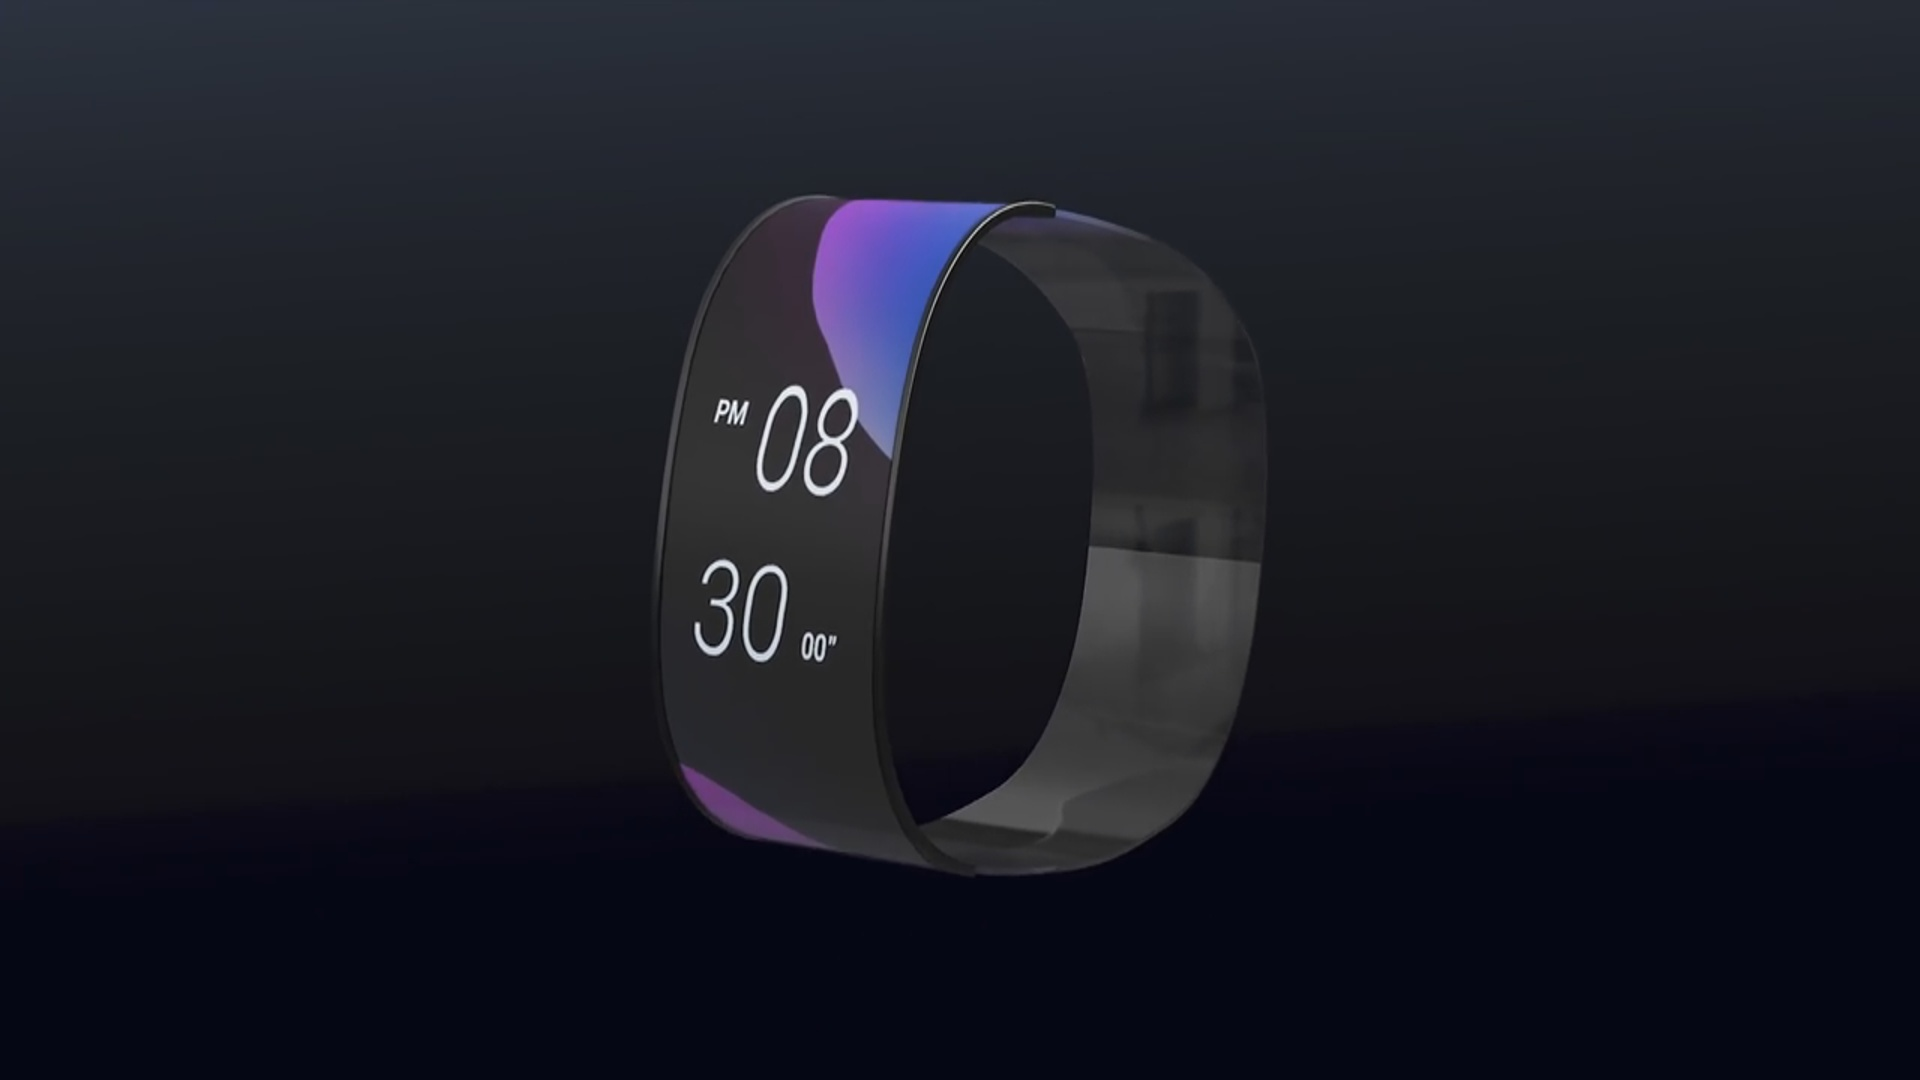 Elastik ekrana malik saat çoxfunksiyalılığı ilə seçilir